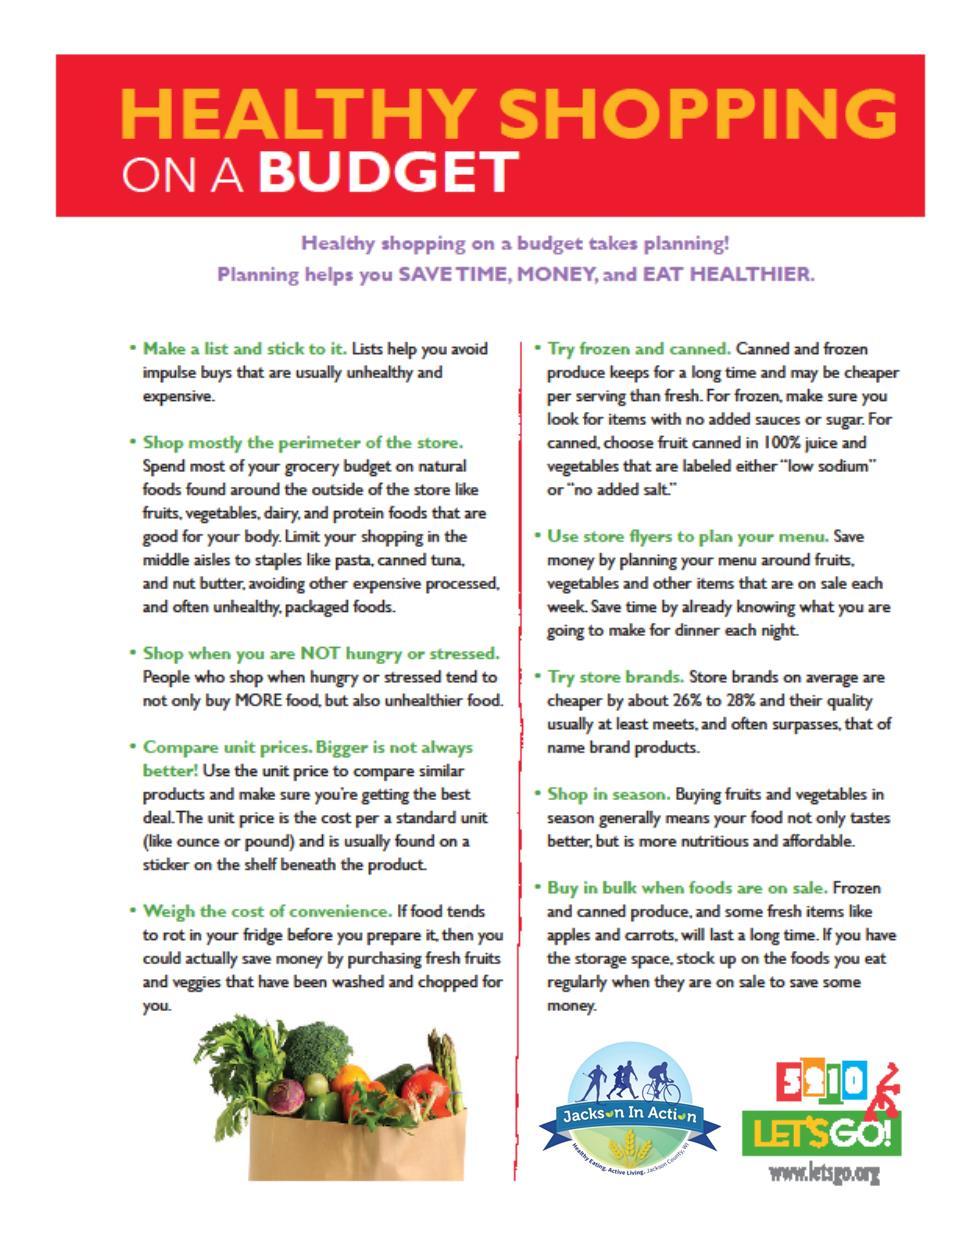 Healthy Shopping on a Budget.jpg